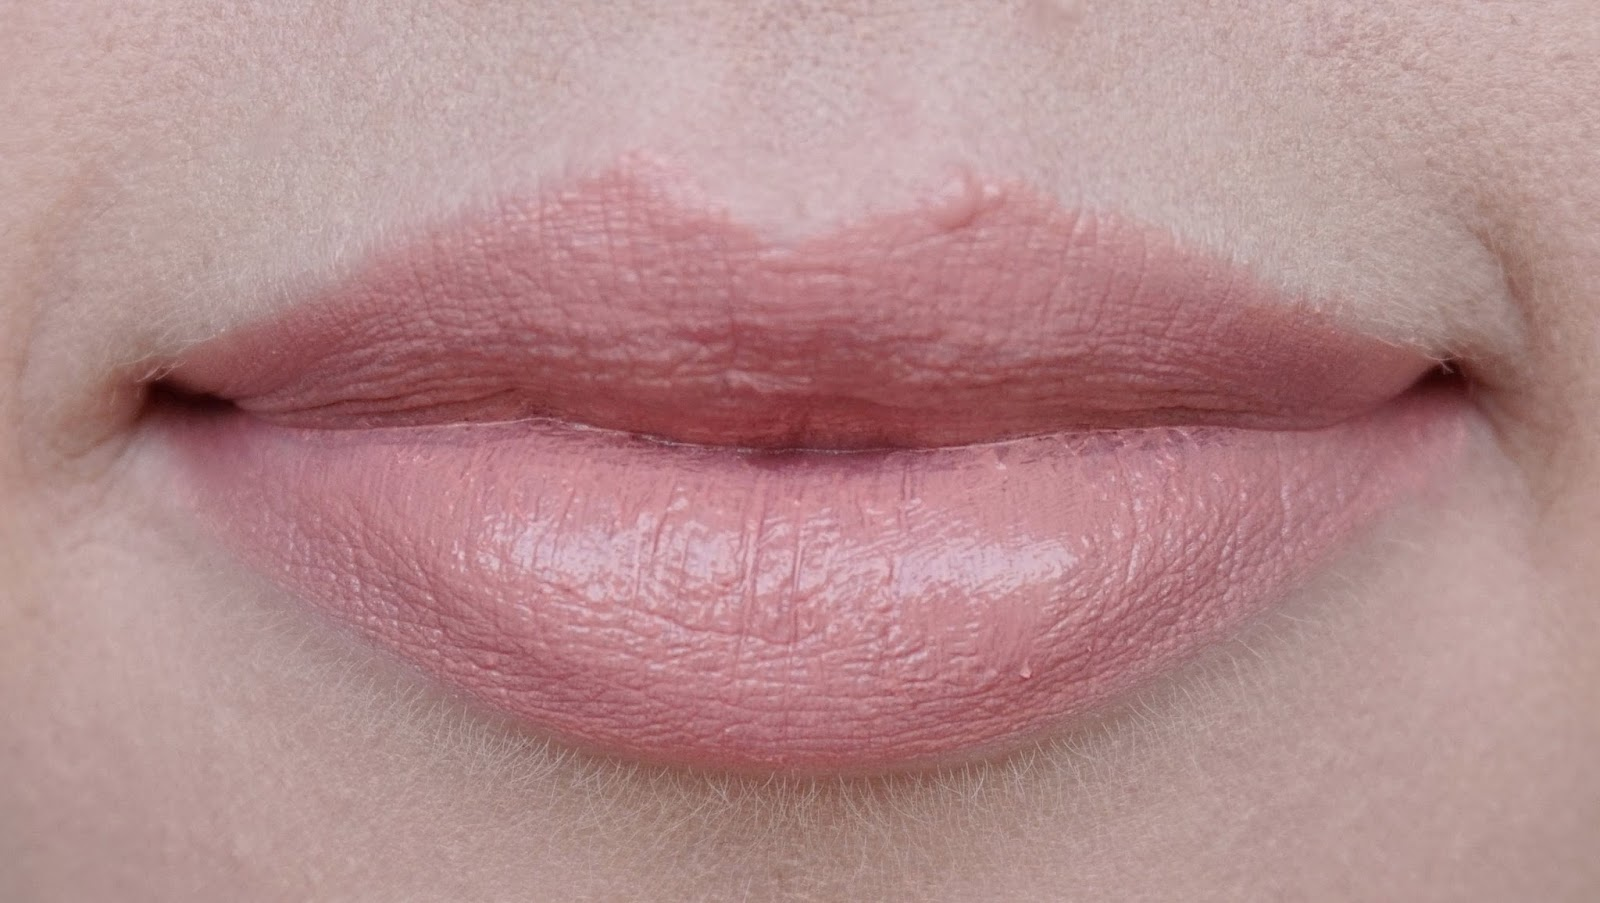 charlotte tilbury hot lips lipstick secret salma kim k.w. miranda may review swatches look kim k.w. 2 lip swatch